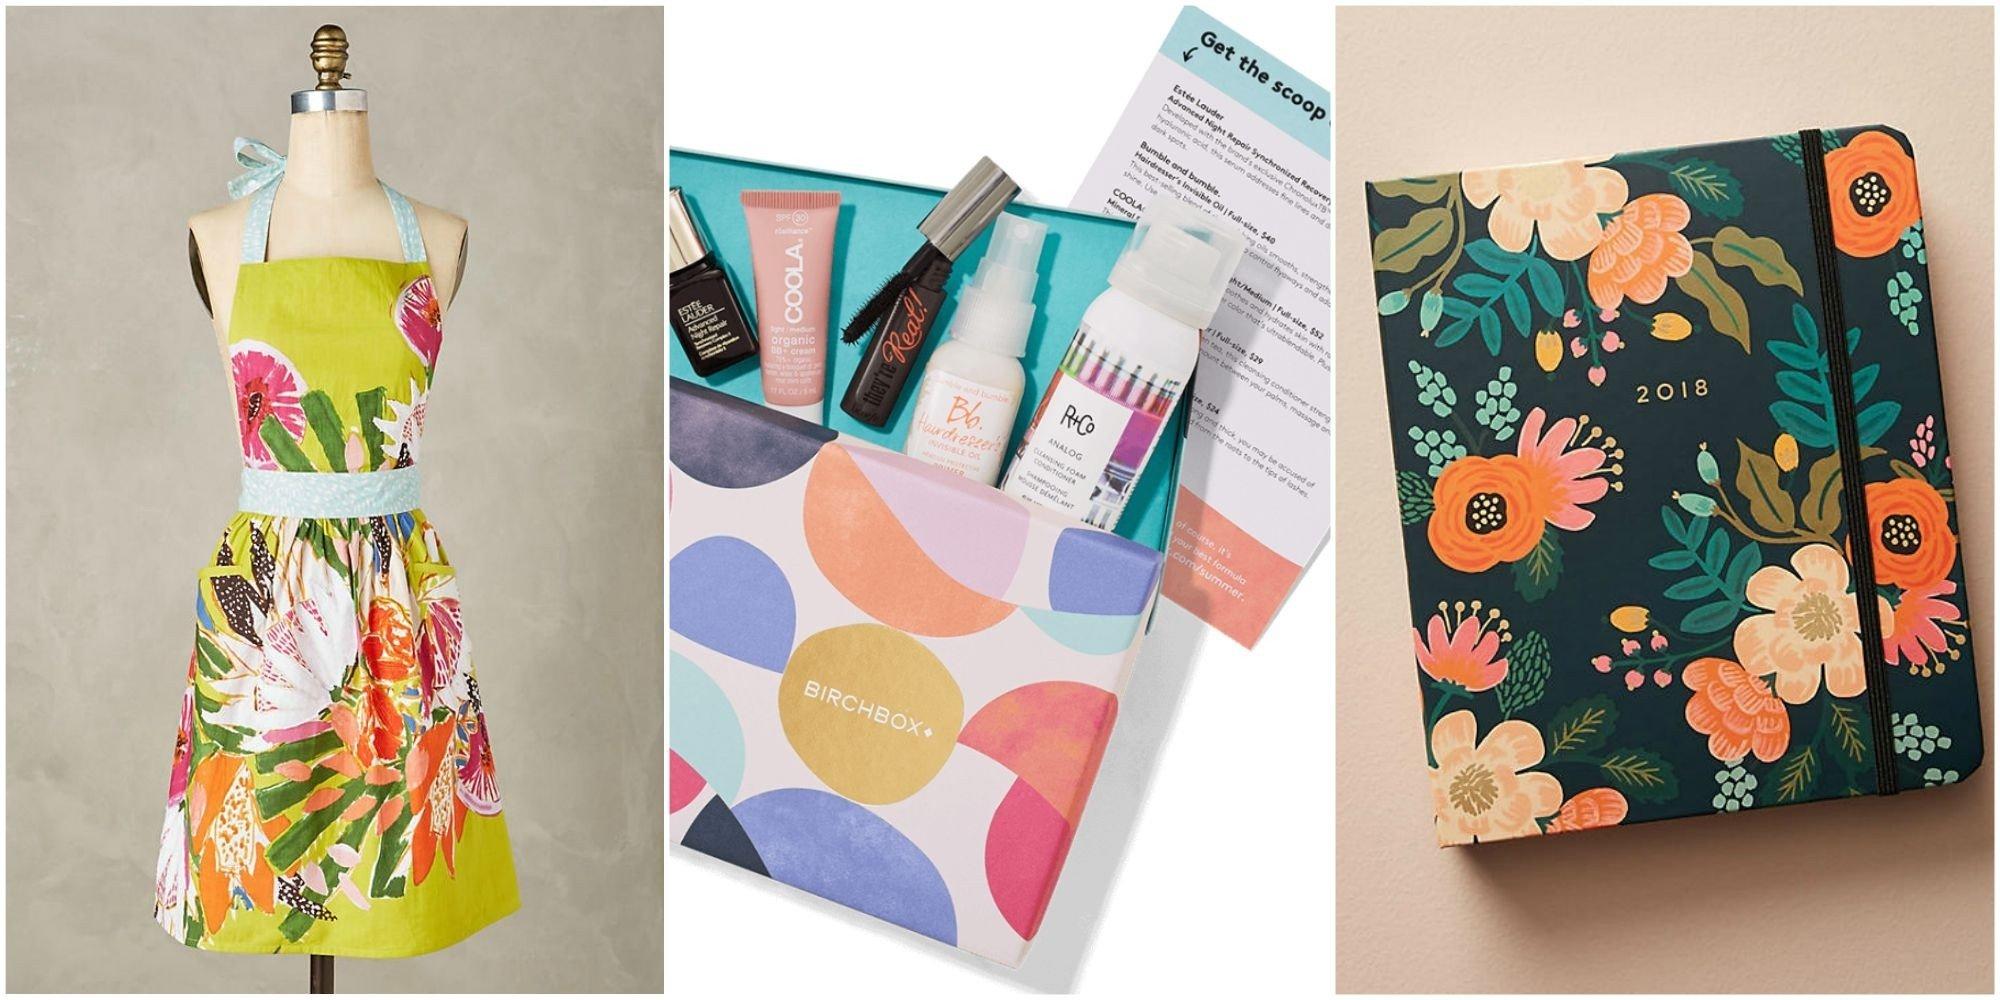 10 Trendy Unique Birthday Ideas For Him 21st birthday present ideas lovely 20 best birthday gift ideas for